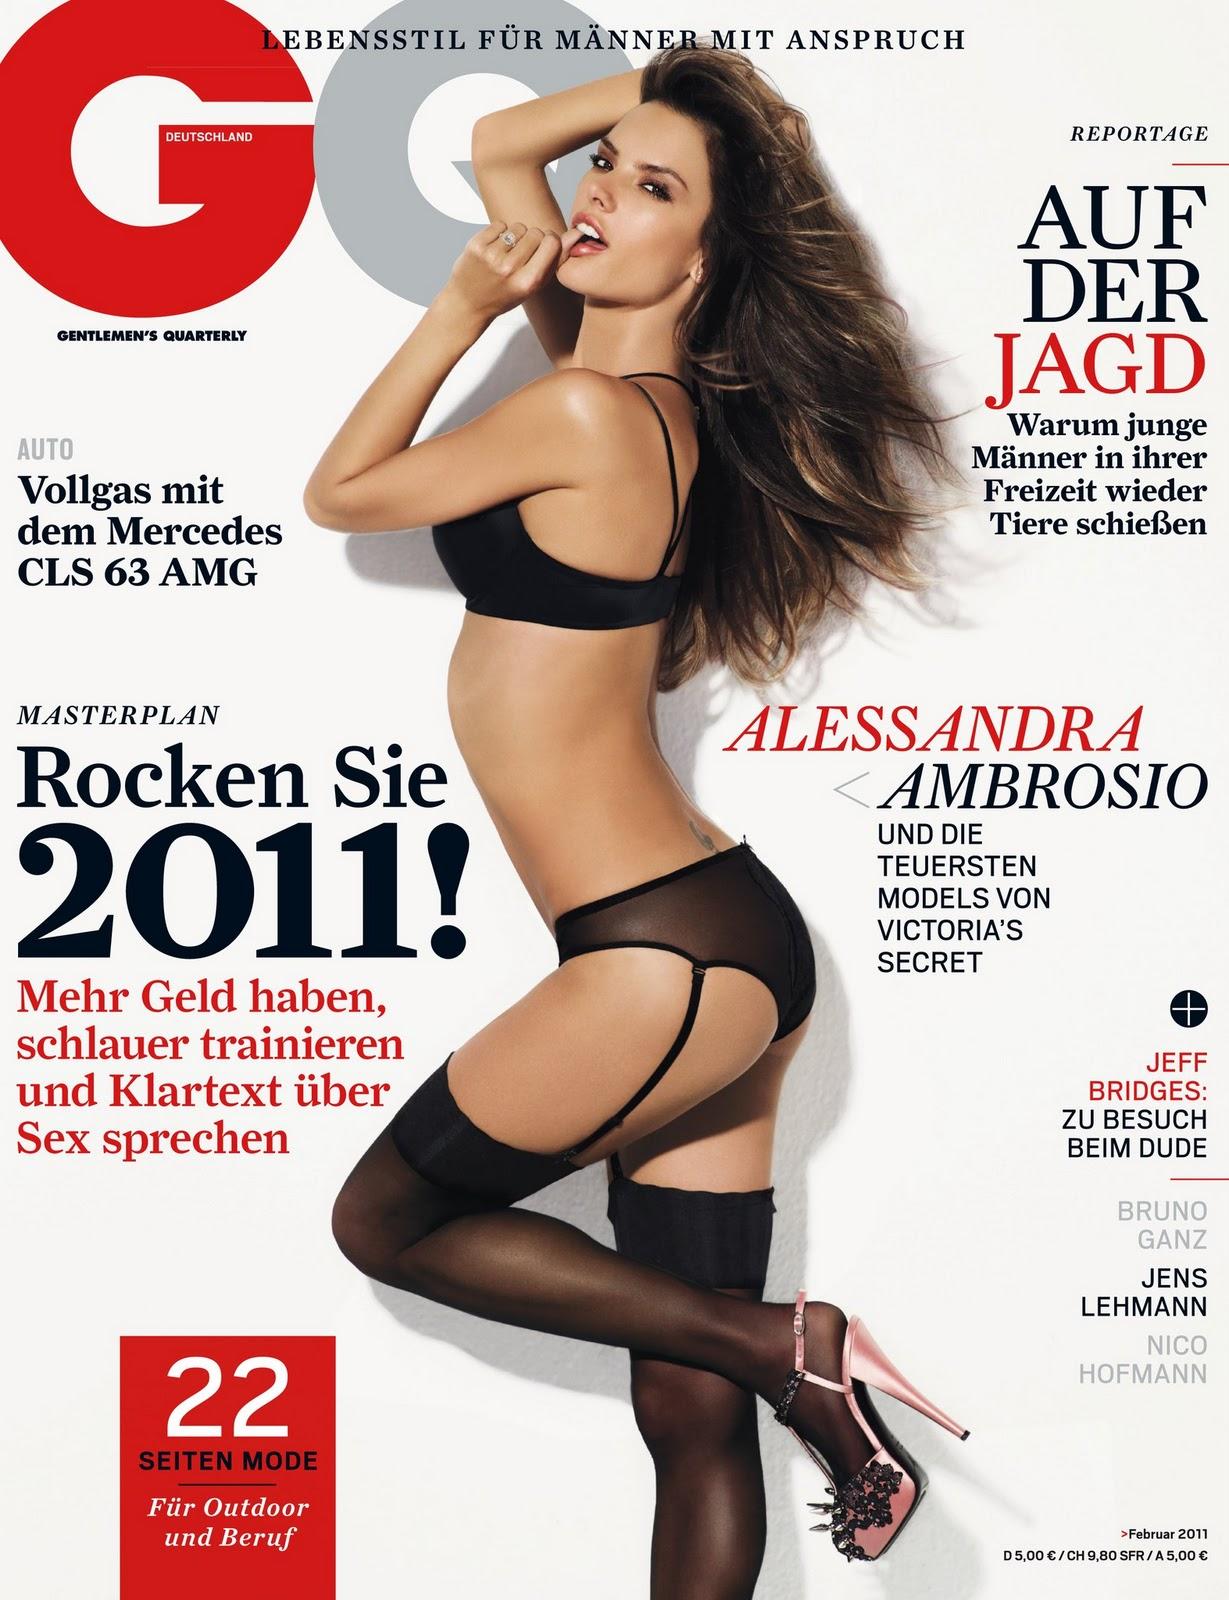 http://1.bp.blogspot.com/_QcYf_8sBCik/TTU83WcLiJI/AAAAAAAAIFA/pGlCRIWtg7o/s1600/Alessandra+Ambrosio+%25E2%2580%2593+GQ+Magazine+%2528Germany%2529+February+2011.jpg